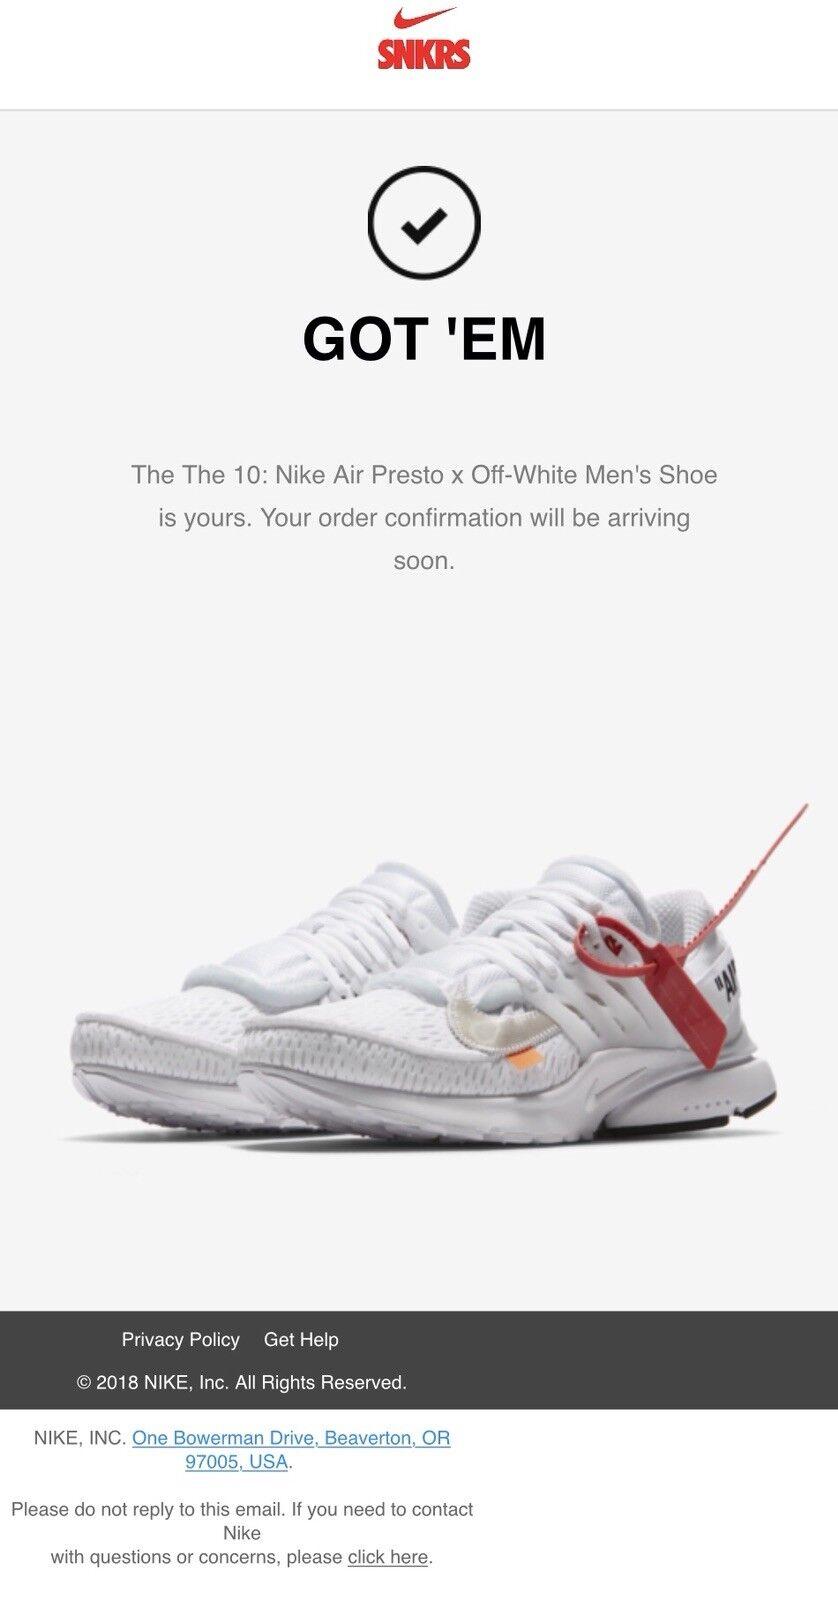 The (Ten) 10: Nike Air Presto x Off-White Men's Shoe - size 11 CONFIRMED.